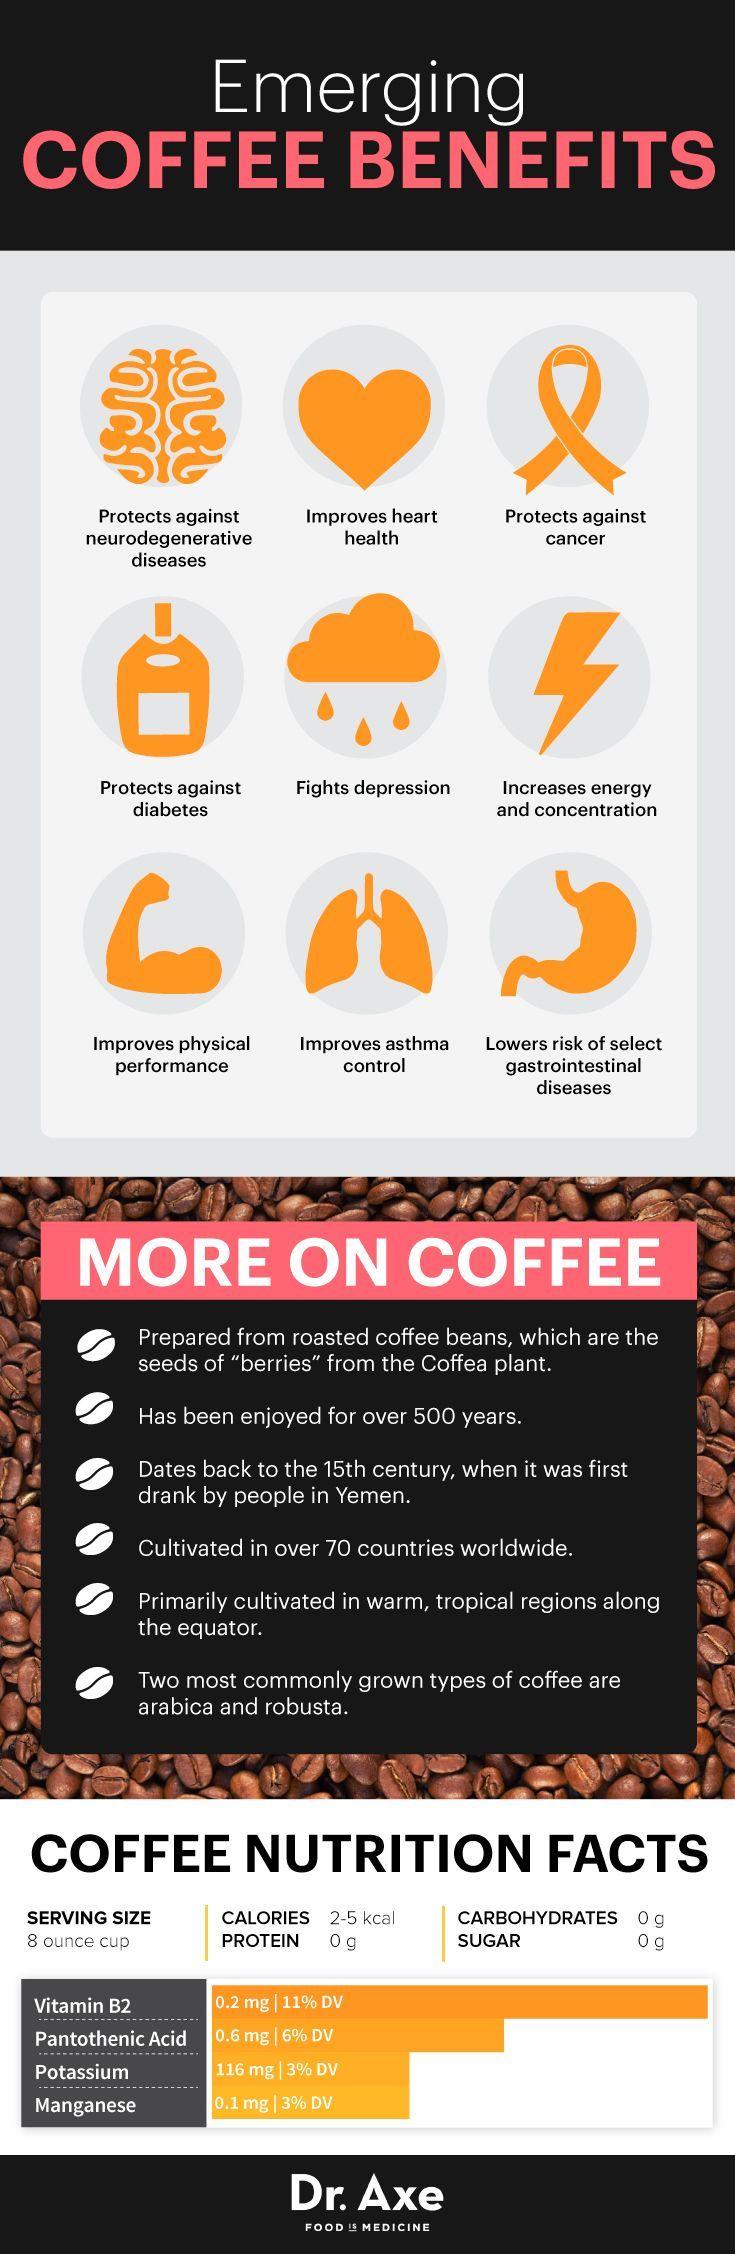 20+ Good Health Reasons To Drink Coffee - Caffeine Informer